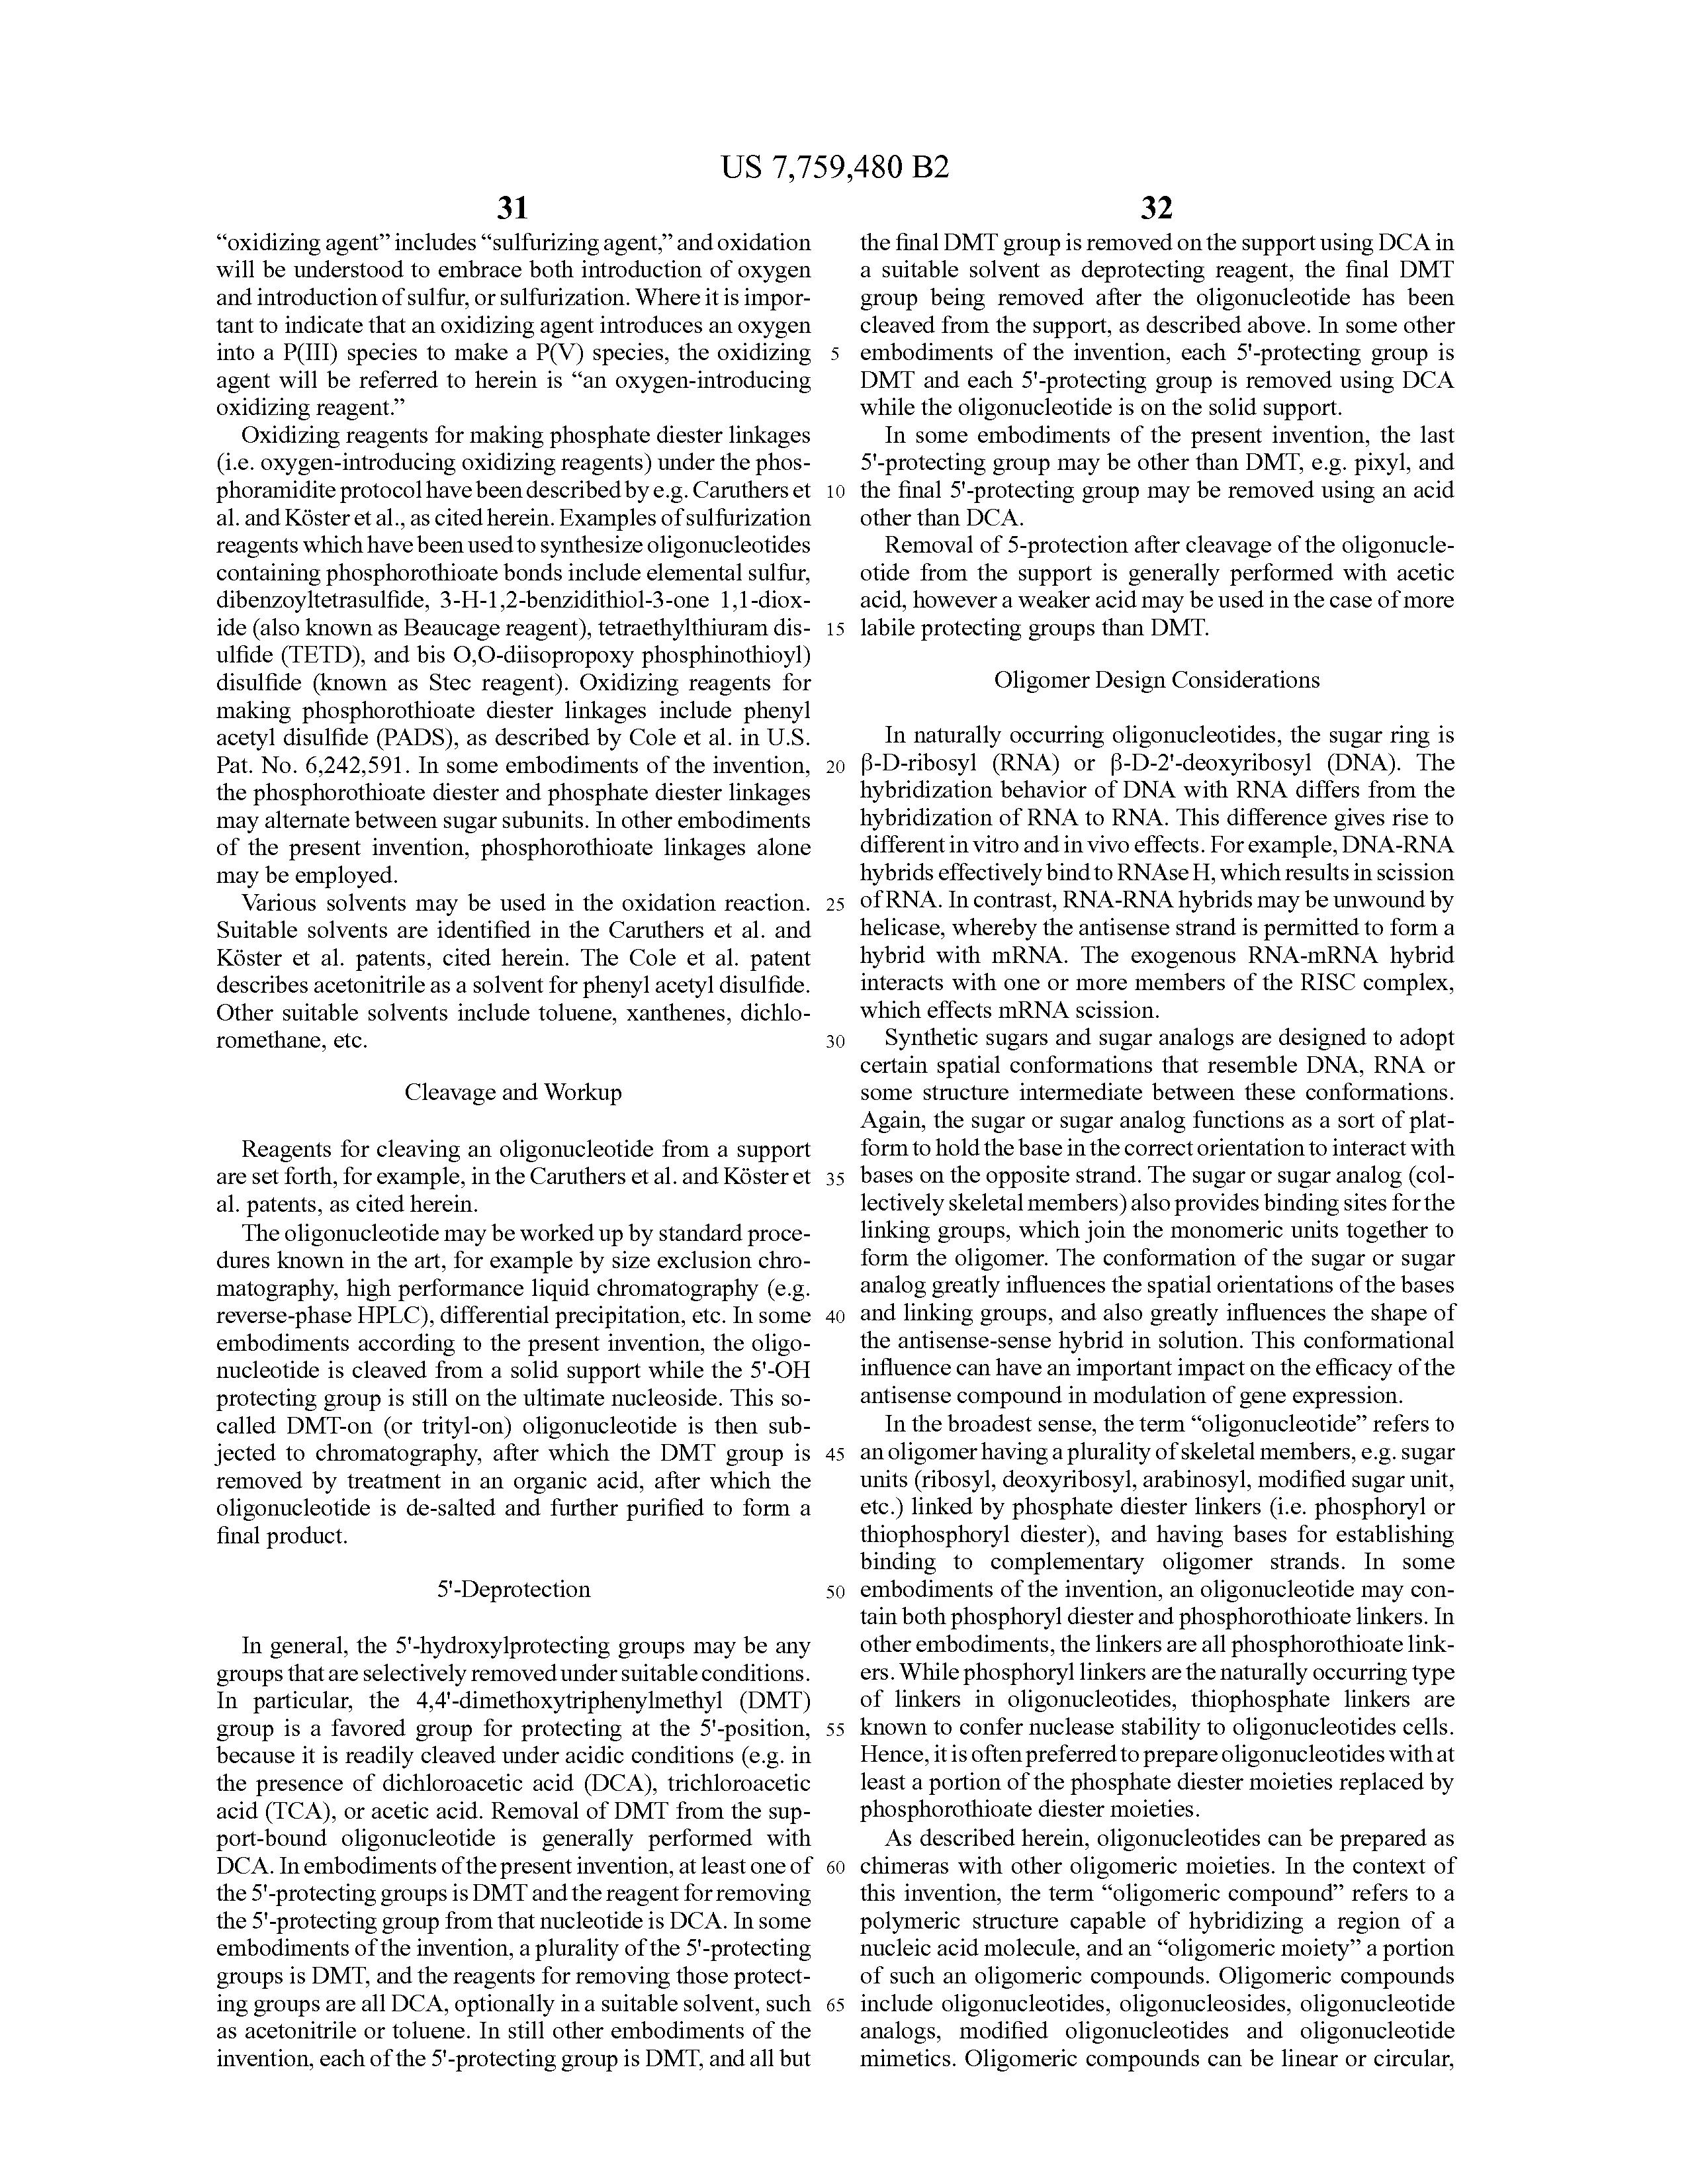 synthesising chloral hydrate Oftewel door: frank ottens uitgegeven op 22-07-2014 om 15:41 maandag sprak de koning tot ons vier dagen na de vliegtuigramp in.